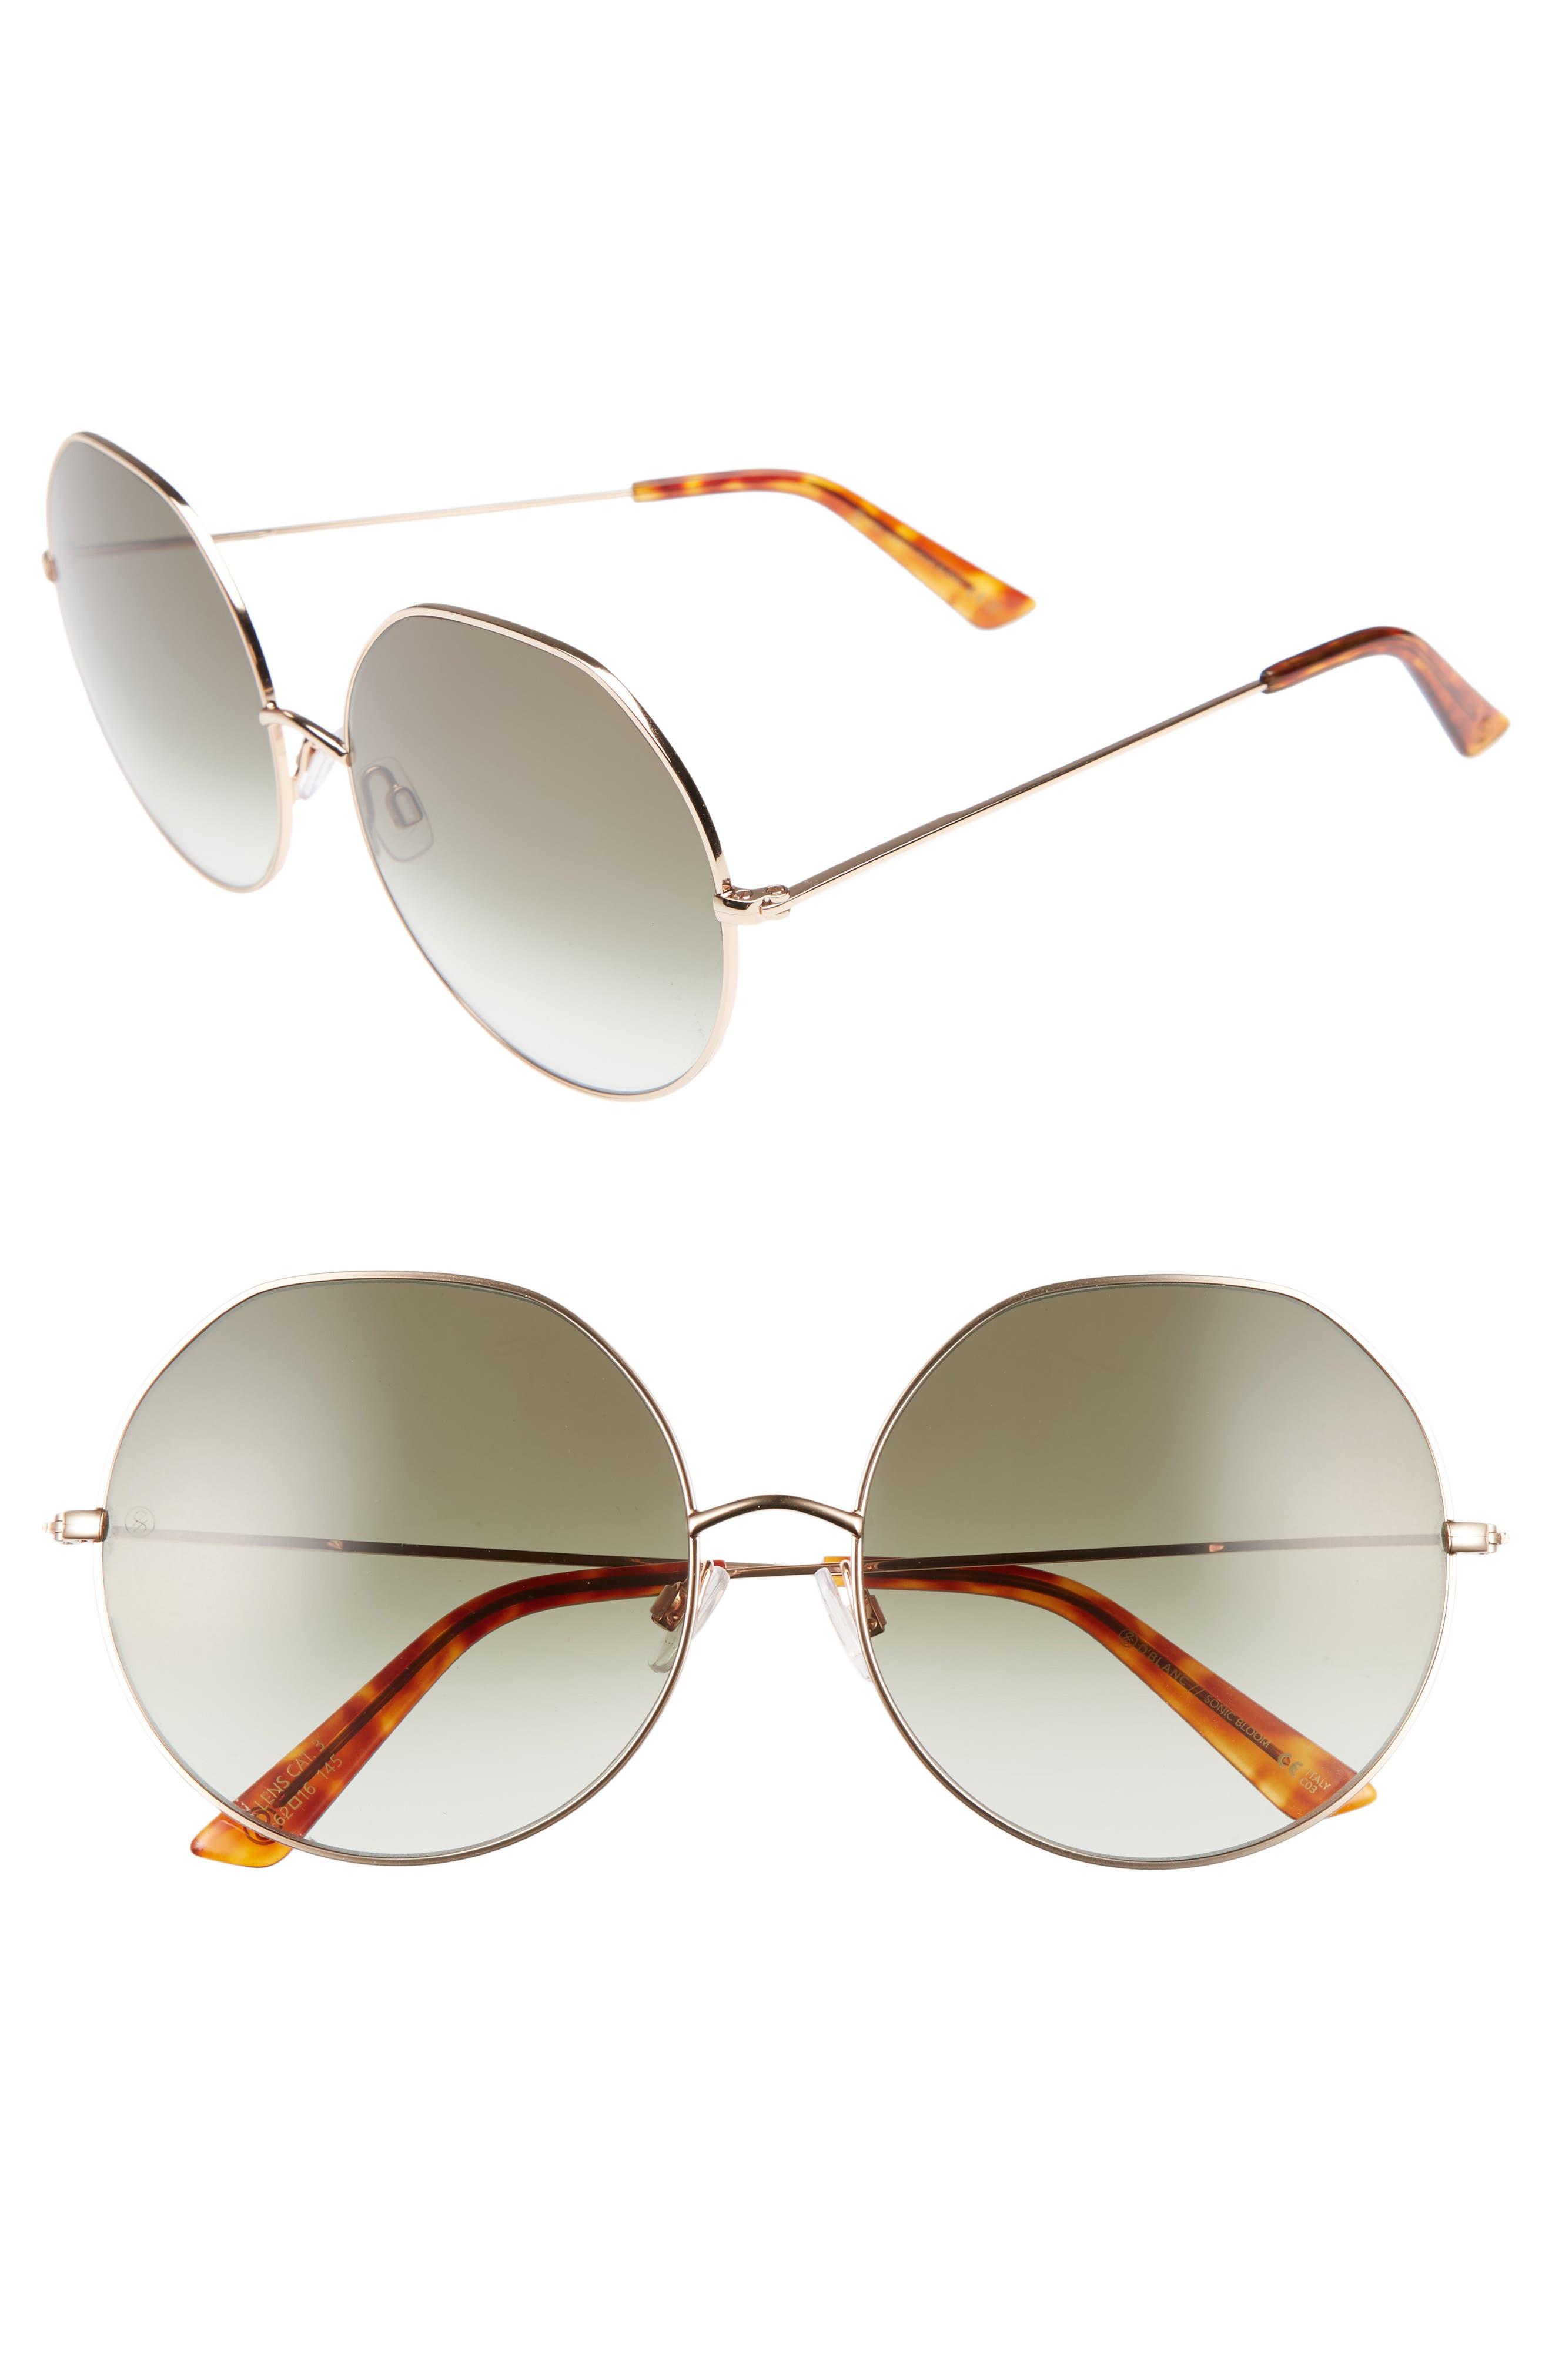 Alternate Image 1 Selected - D'BLANC Sonic Boom 62mm Gradient Round Sunglasses